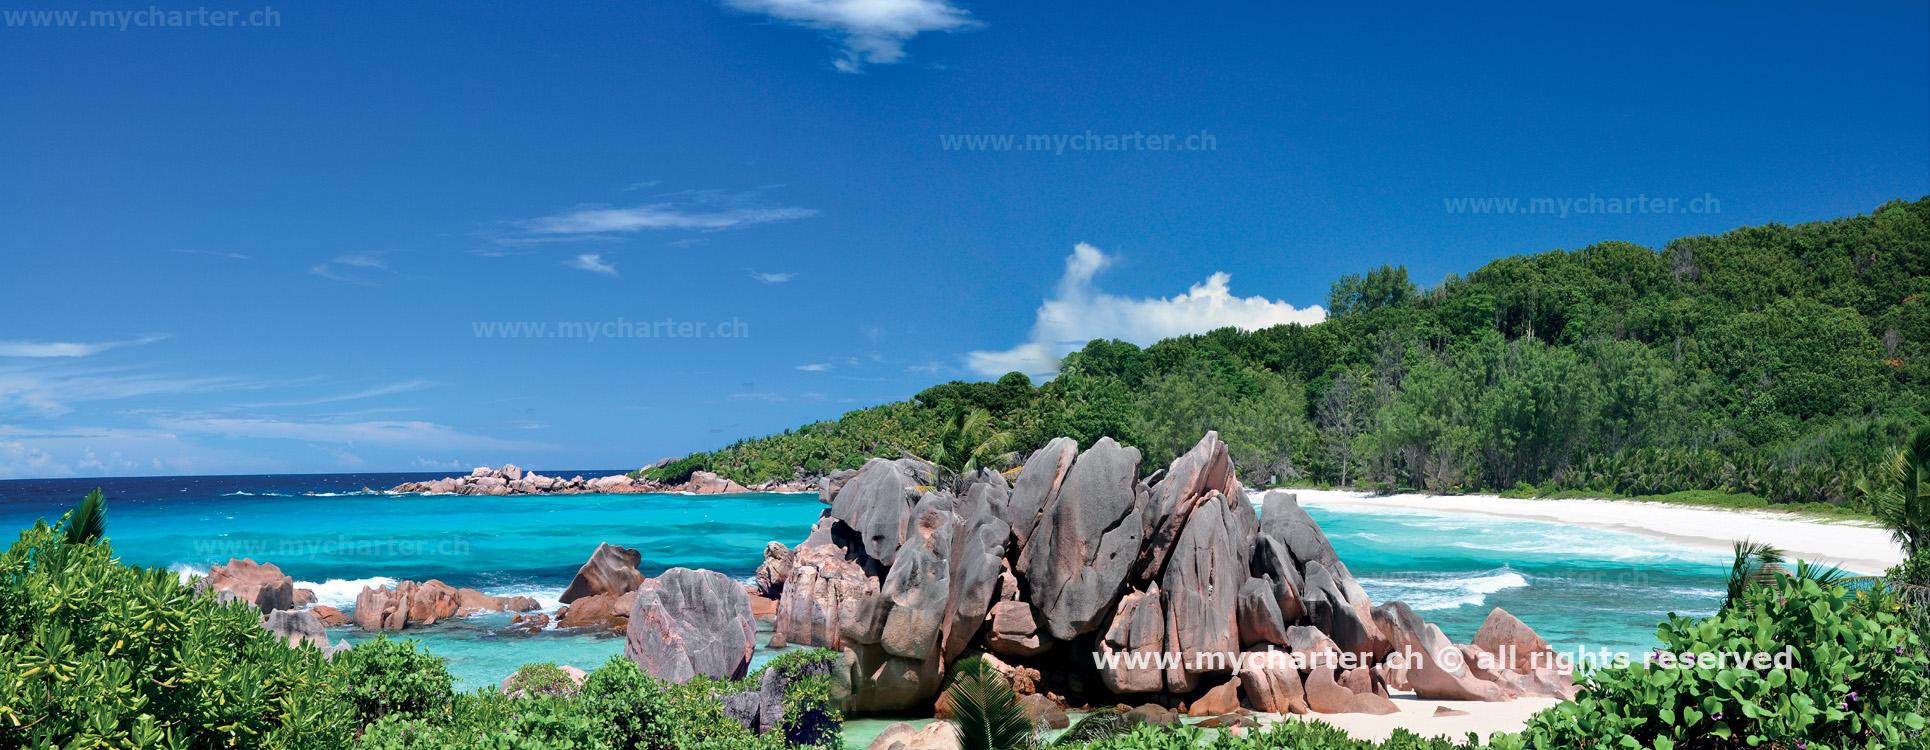 Seychellen - Anse Coco